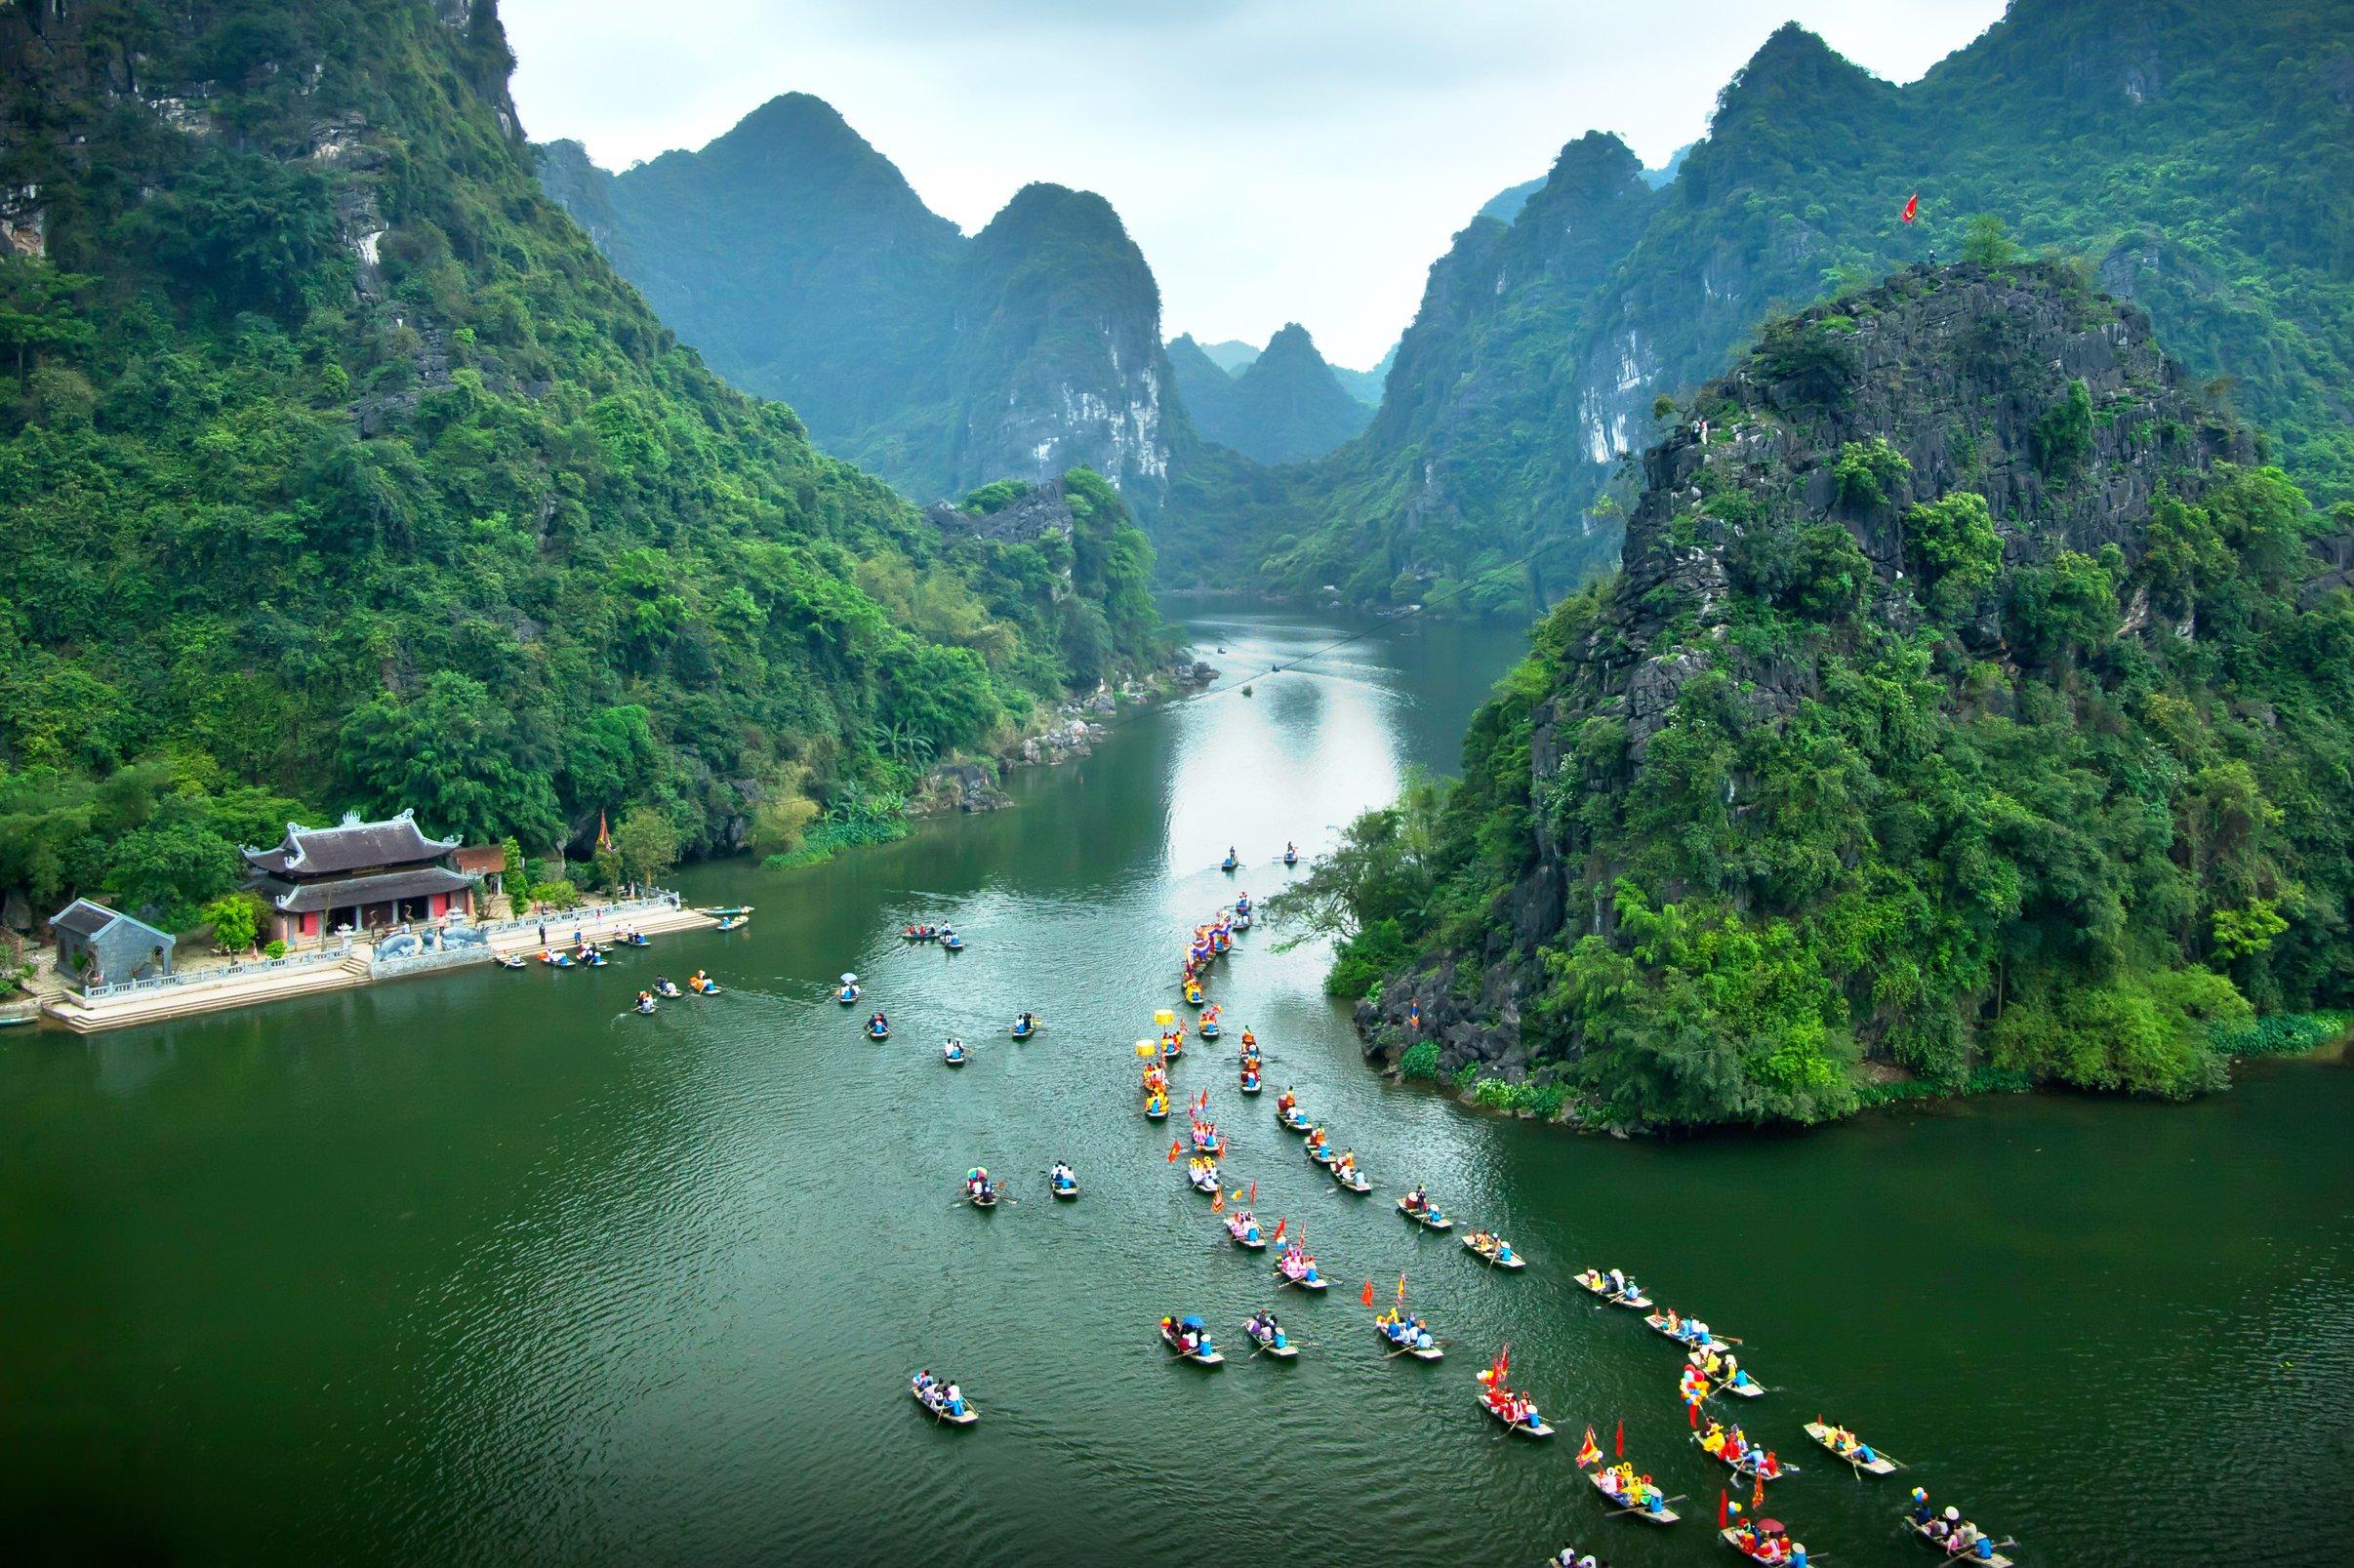 2-Day Hanoi to Ninh Binh - Vietnam Itinerary